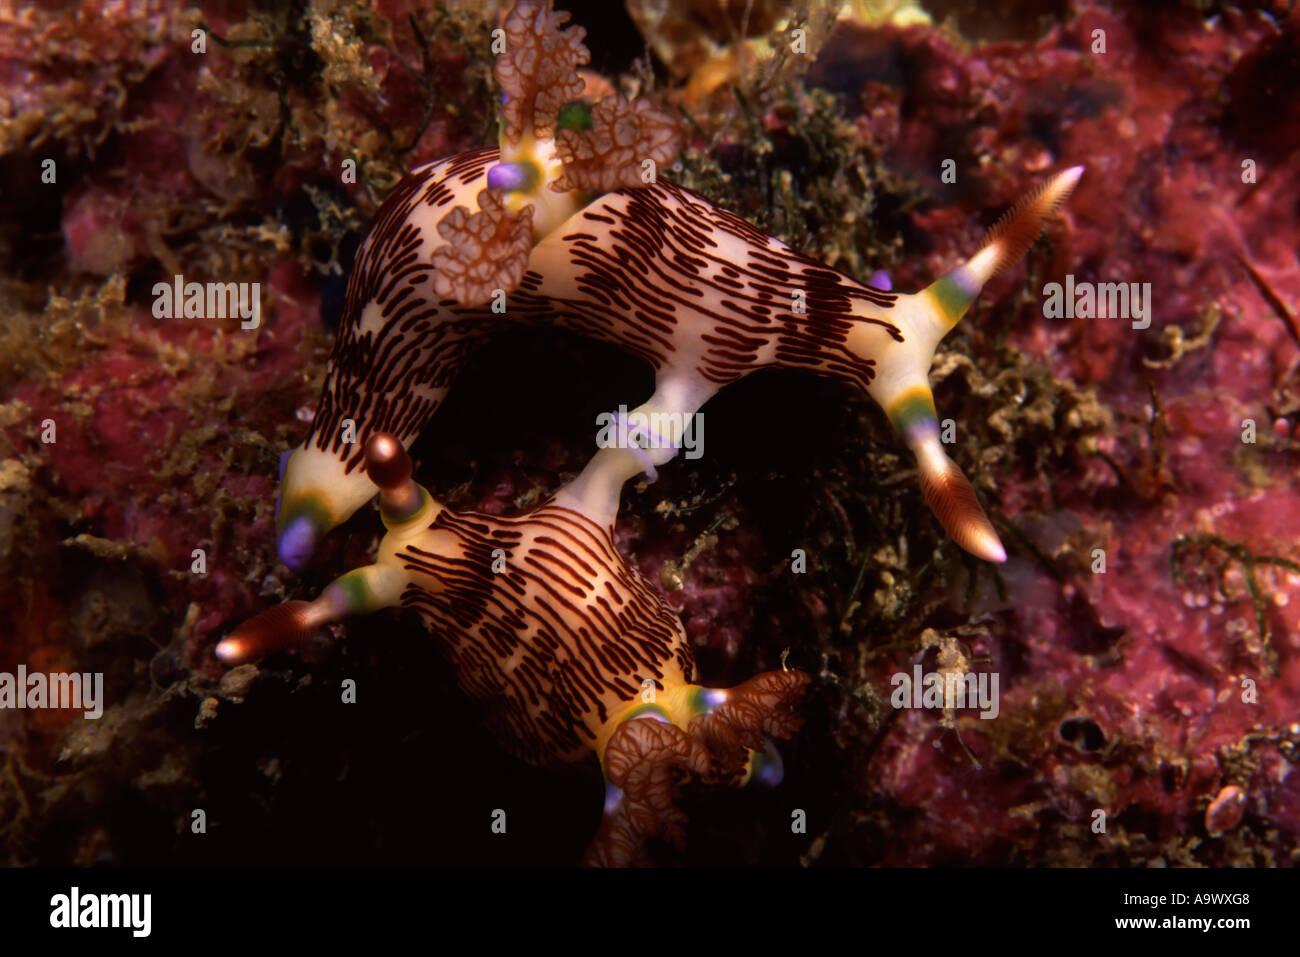 Mating Nembrotha lineolata - Stock Image